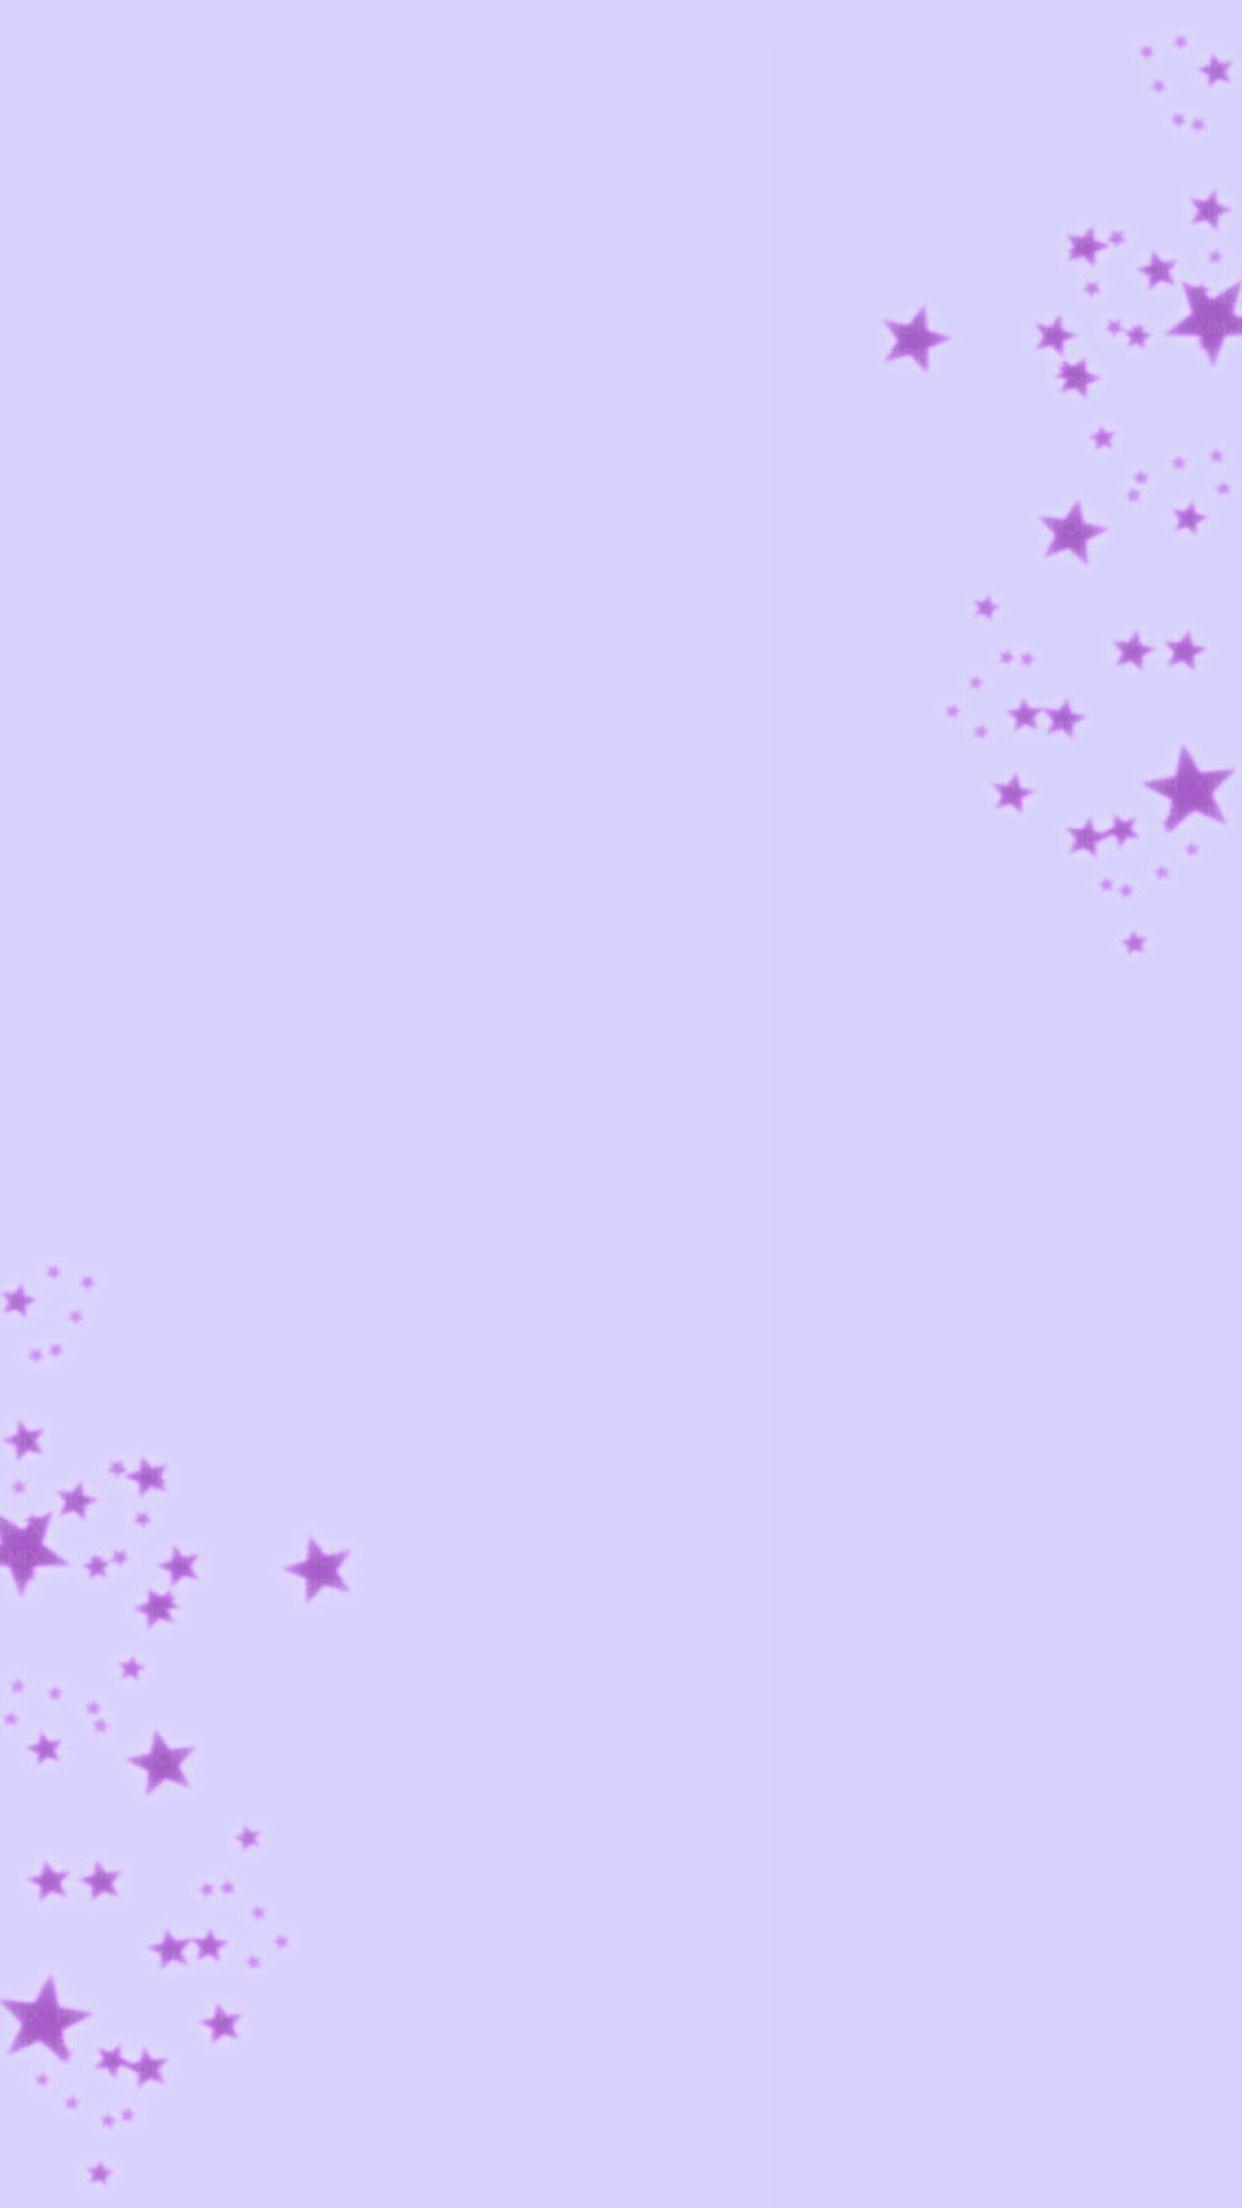 Instagram Story Pastel Purple Background Instagram Purple Backgrounds Instagram Photo